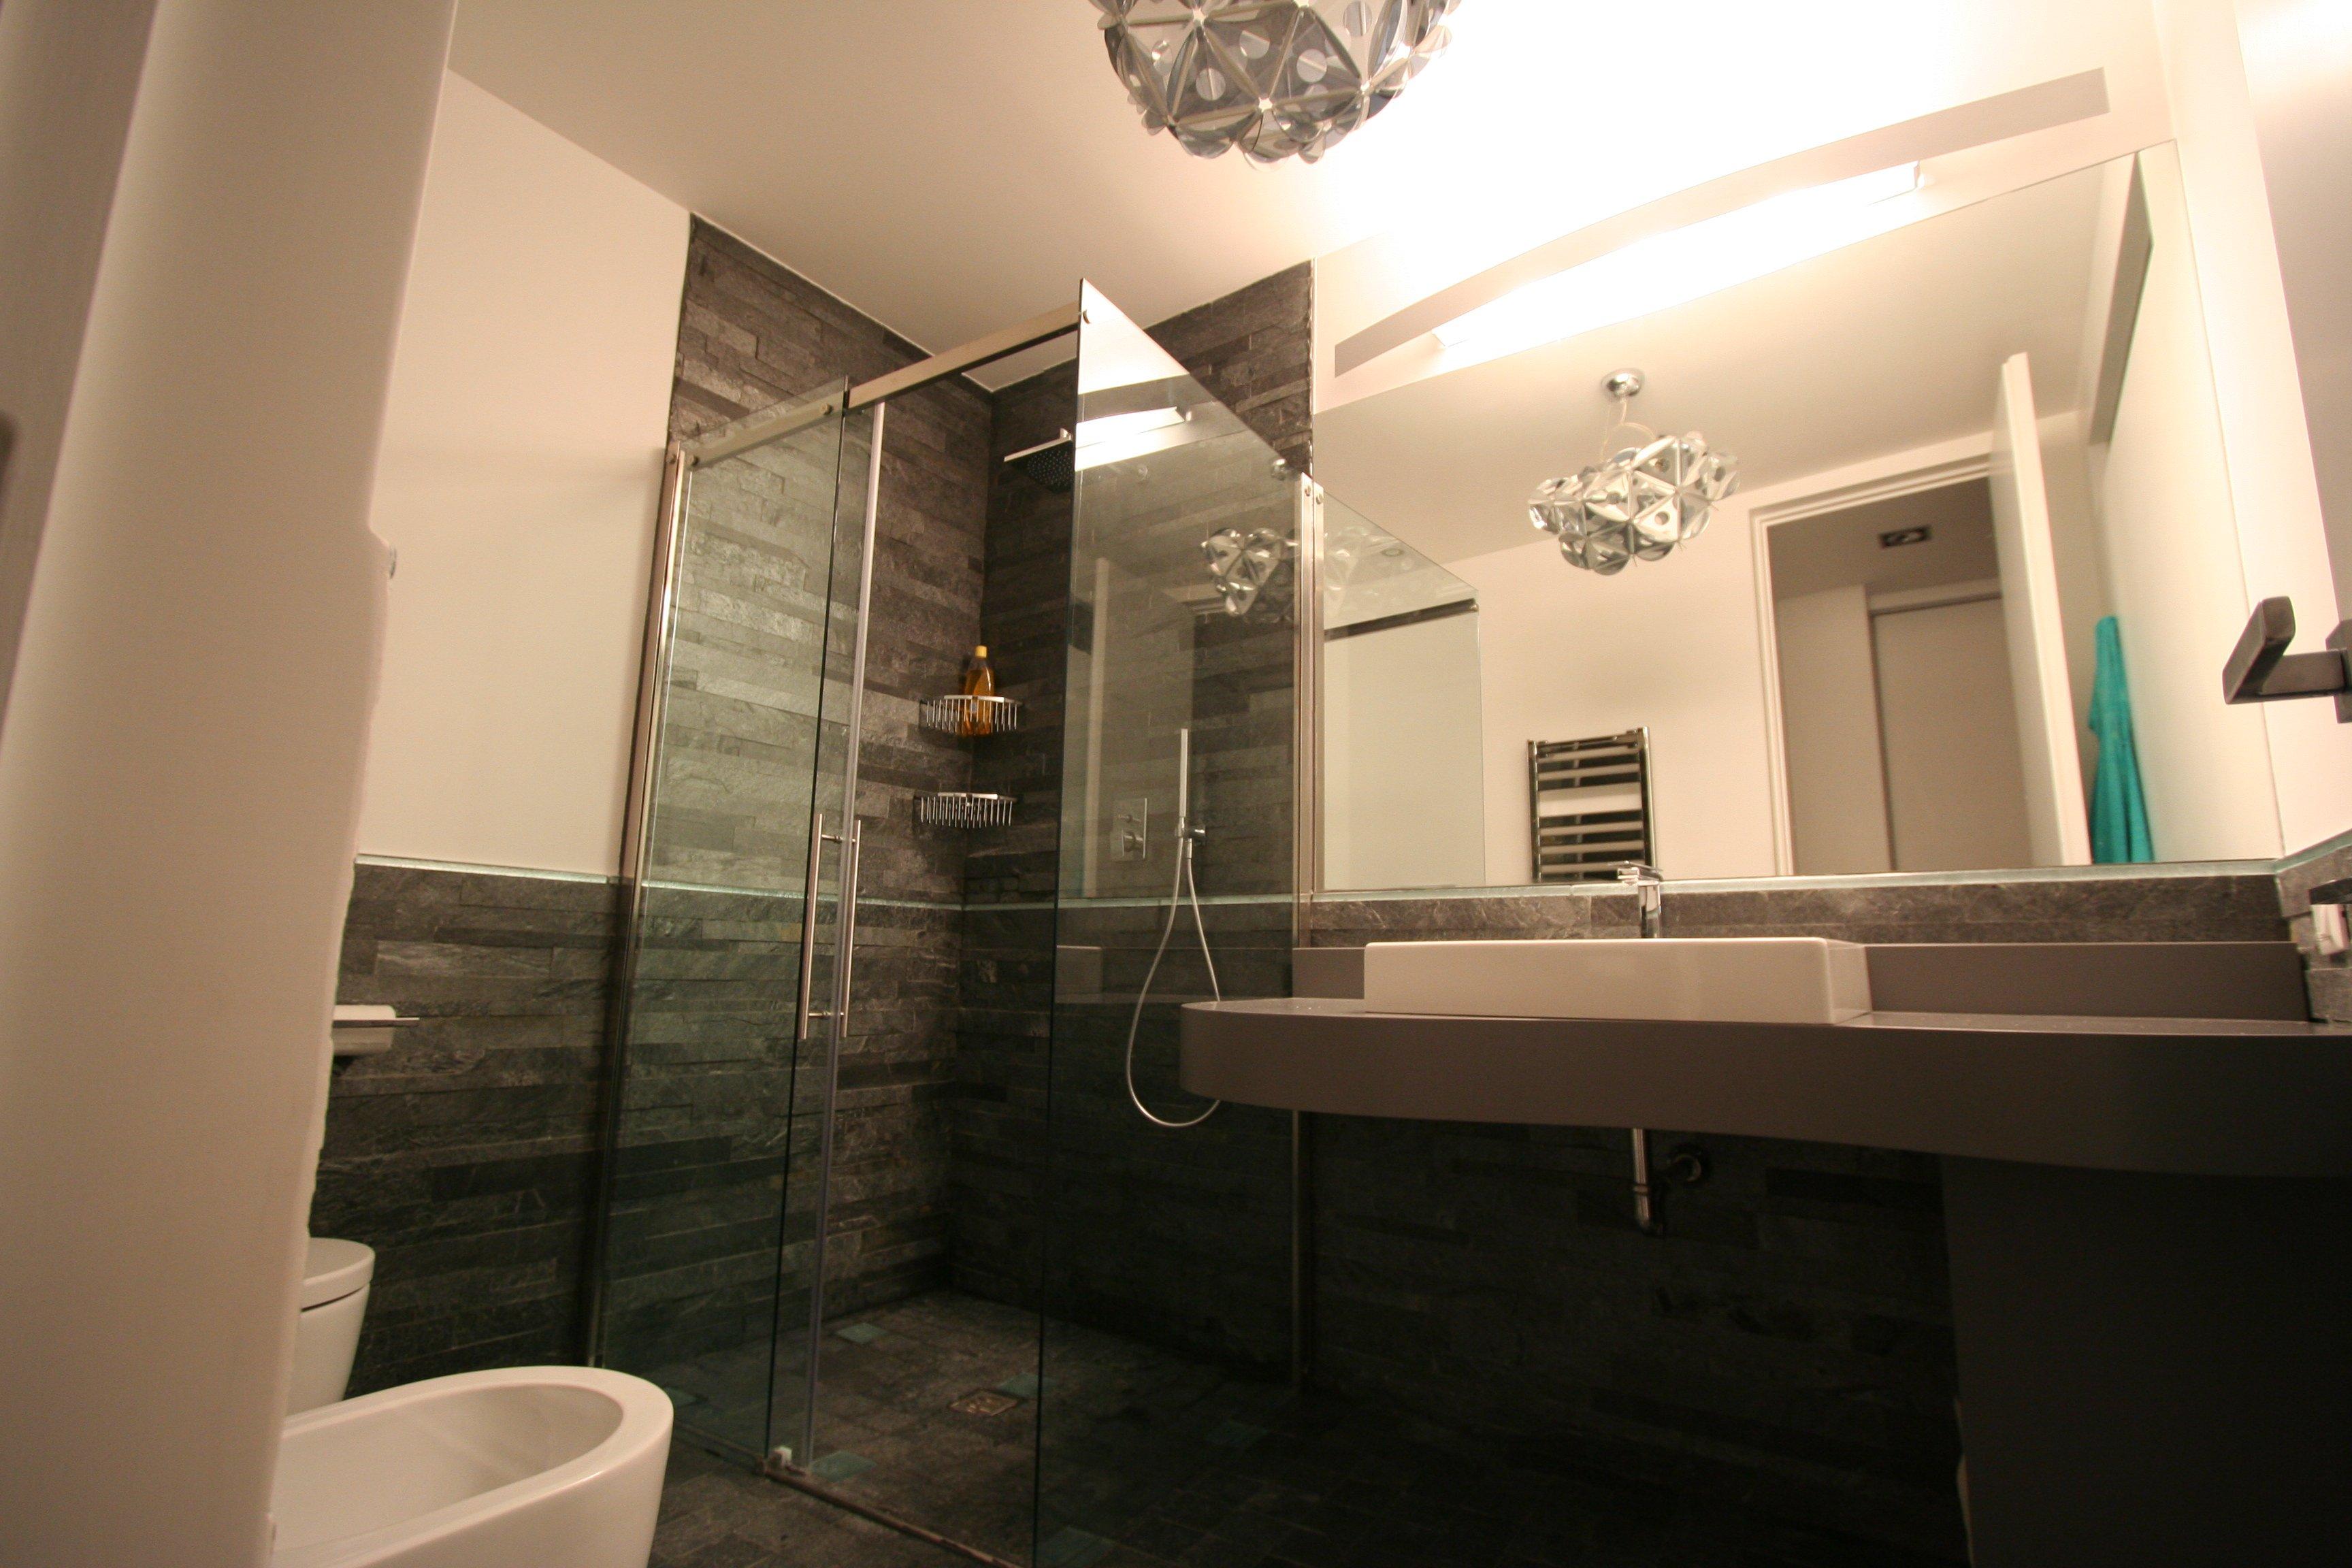 Image bagno grande foto 5 vista largo - Bagno moderno con vasca ...